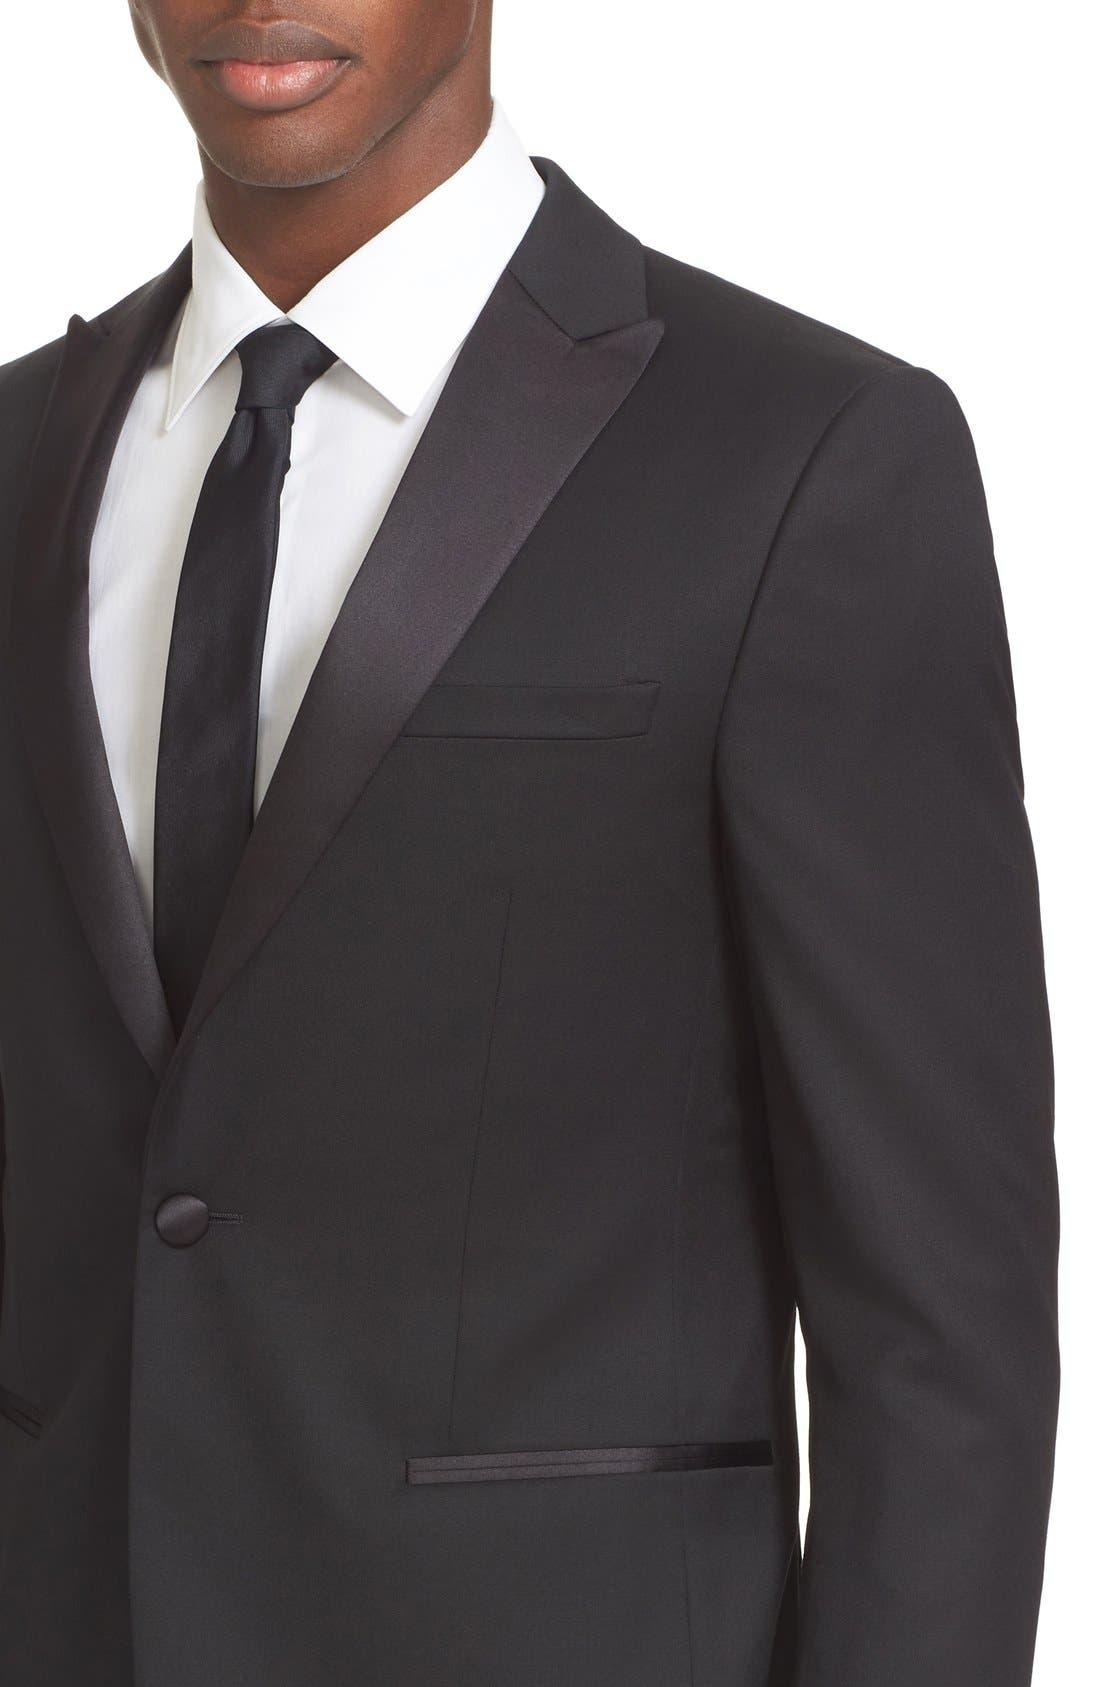 Trim Fit Wool & Mohair Tuxedo,                             Alternate thumbnail 4, color,                             Black